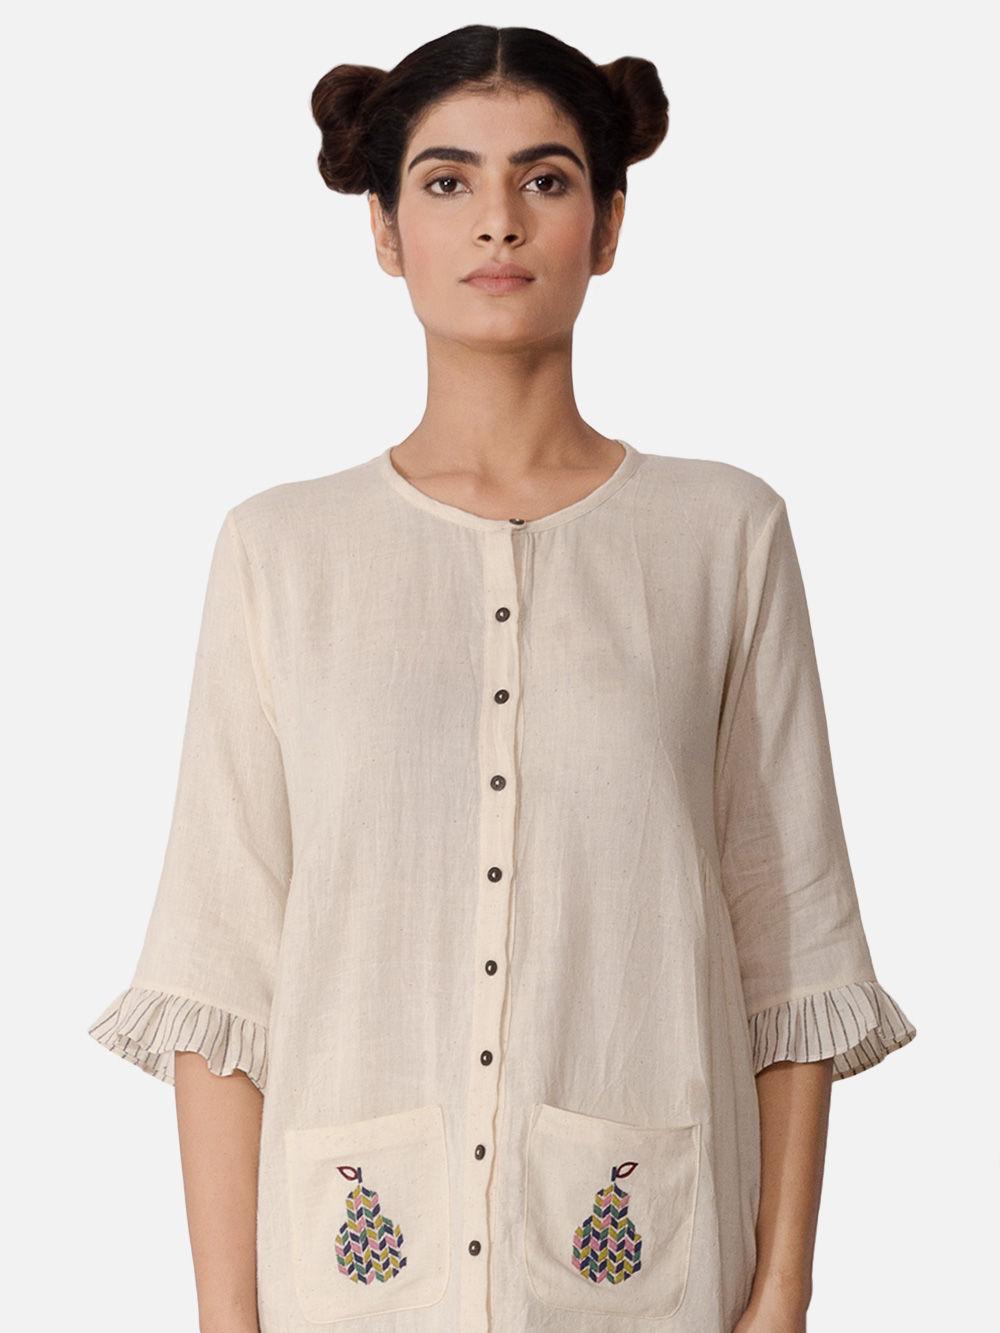 Buy off white cotton hand embroidered short kurta online